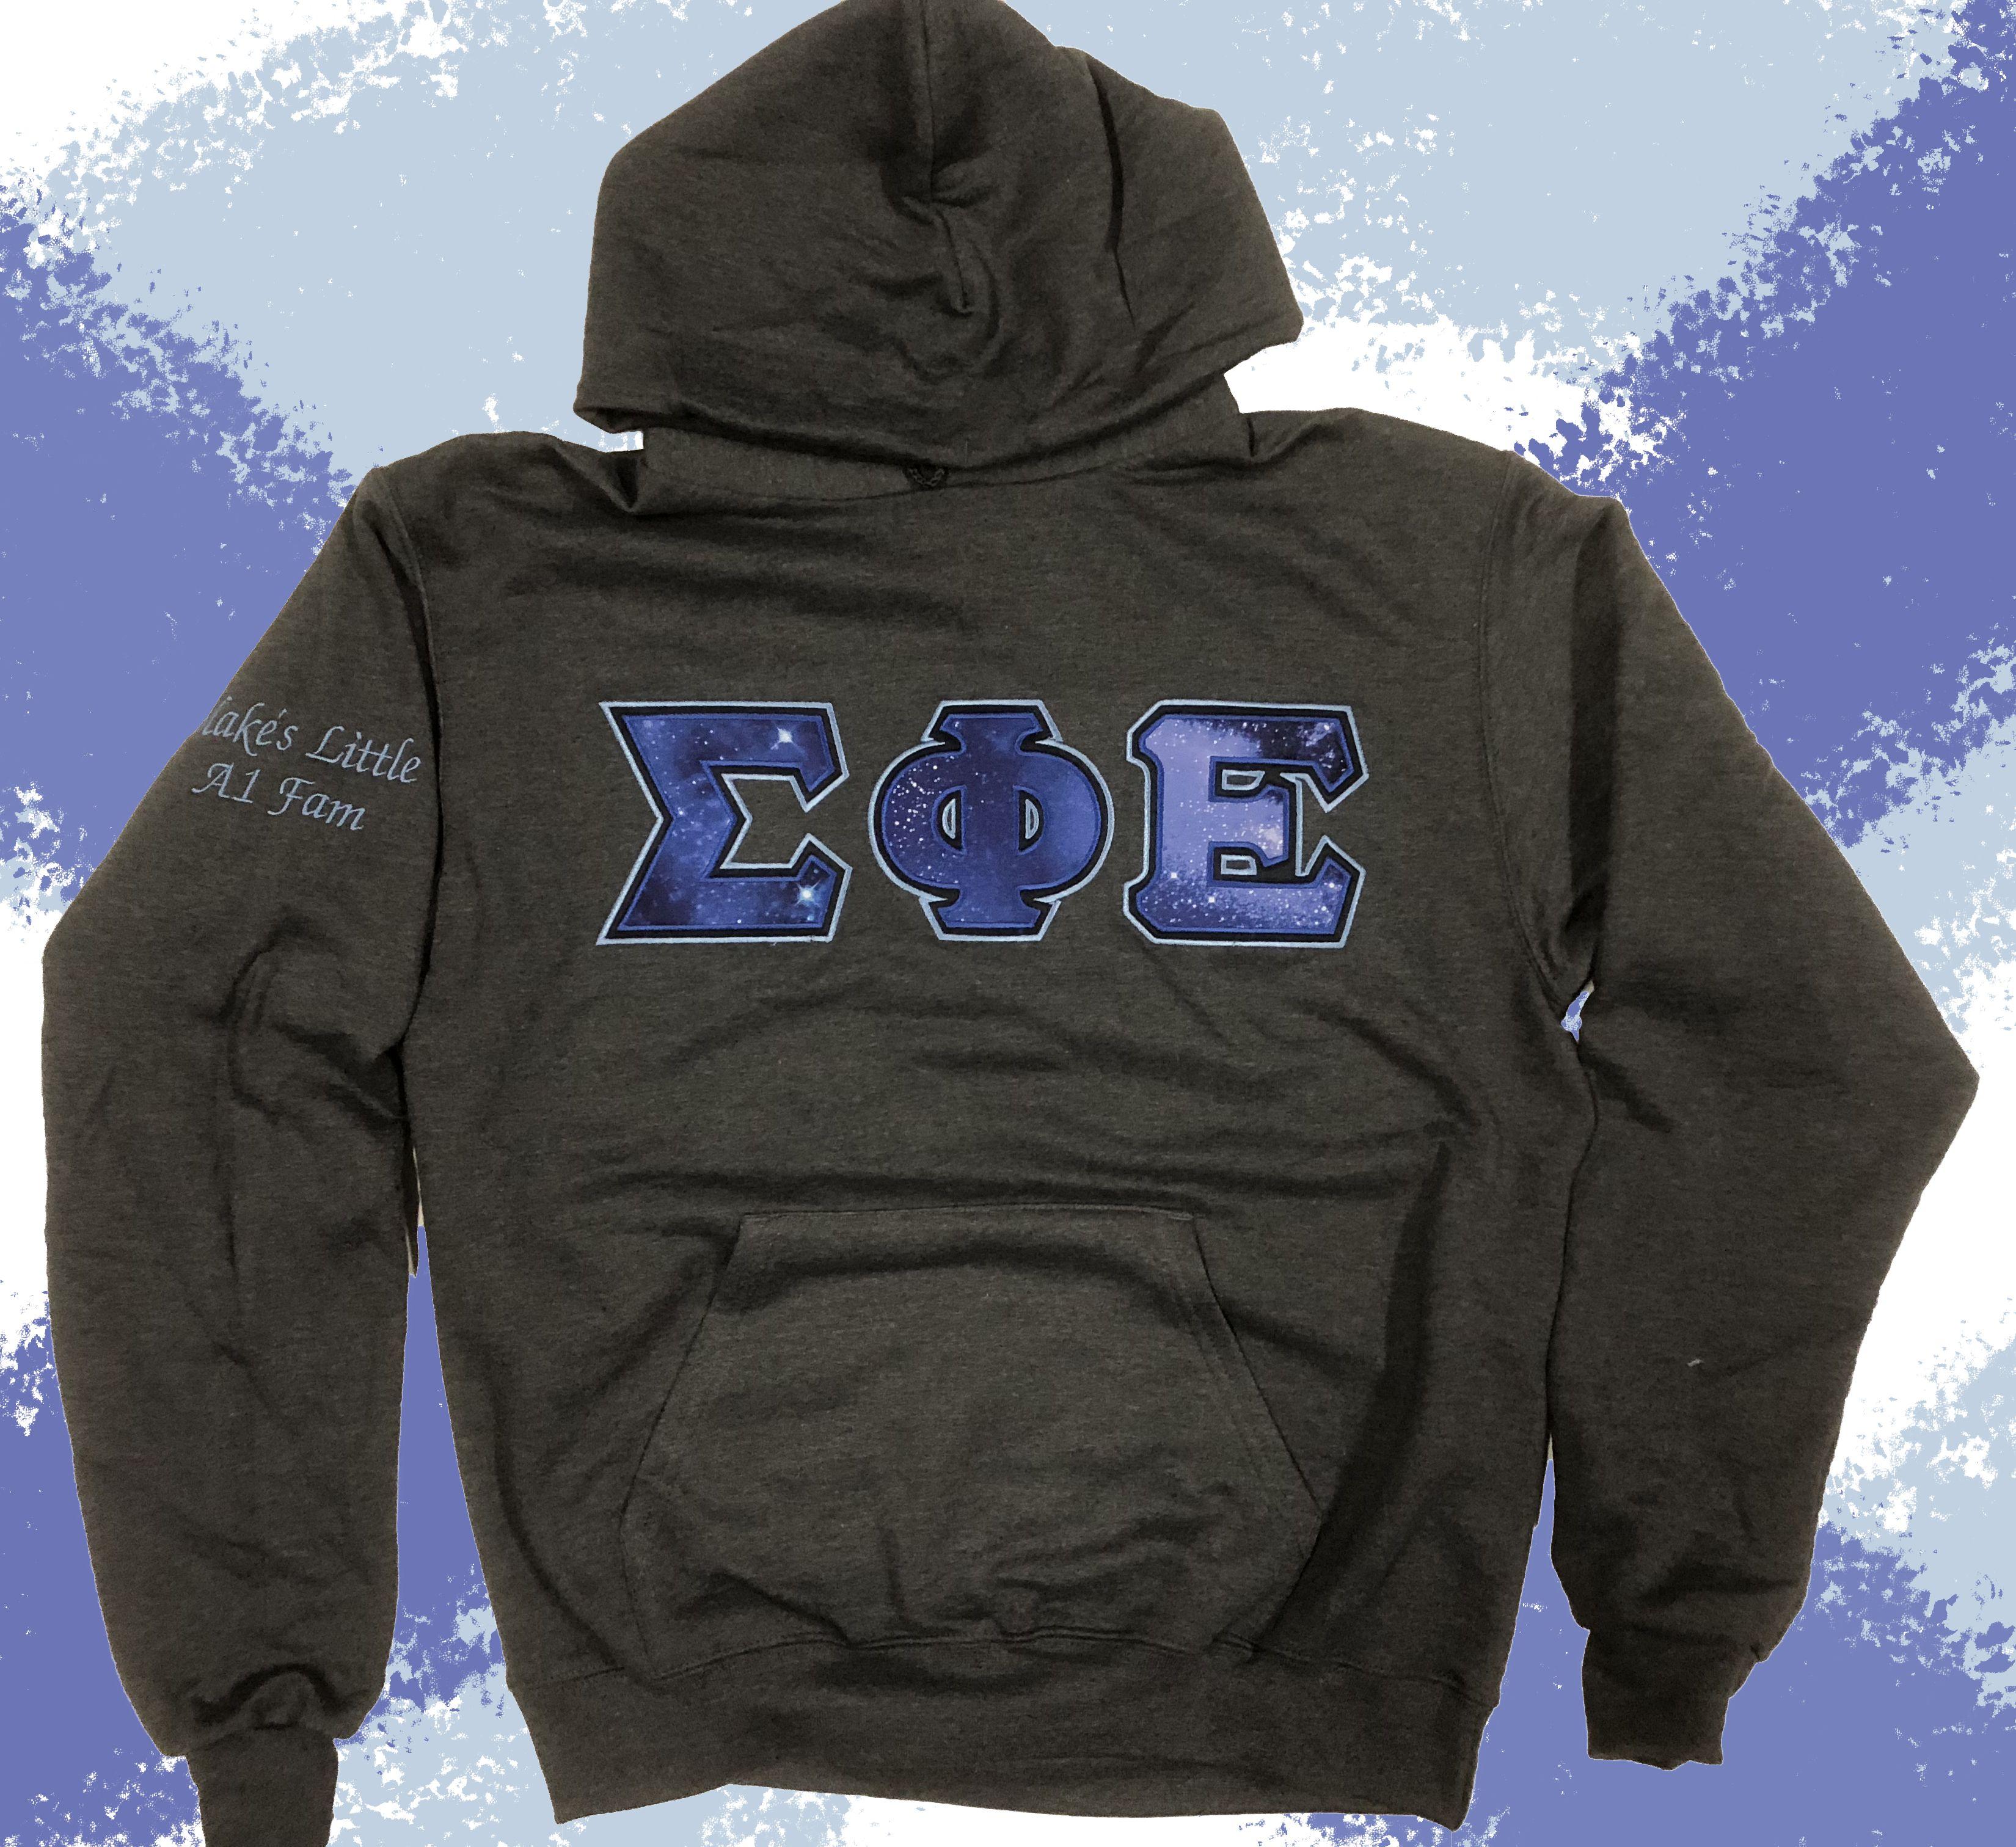 Custom Greek Sweatshirts Champion Fraternity Hoodie Add Your Stitch Letters Designergreek Sweatshirts Champion Hooded Sweatshirt Letter Sweatshirt [ 3024 x 3300 Pixel ]